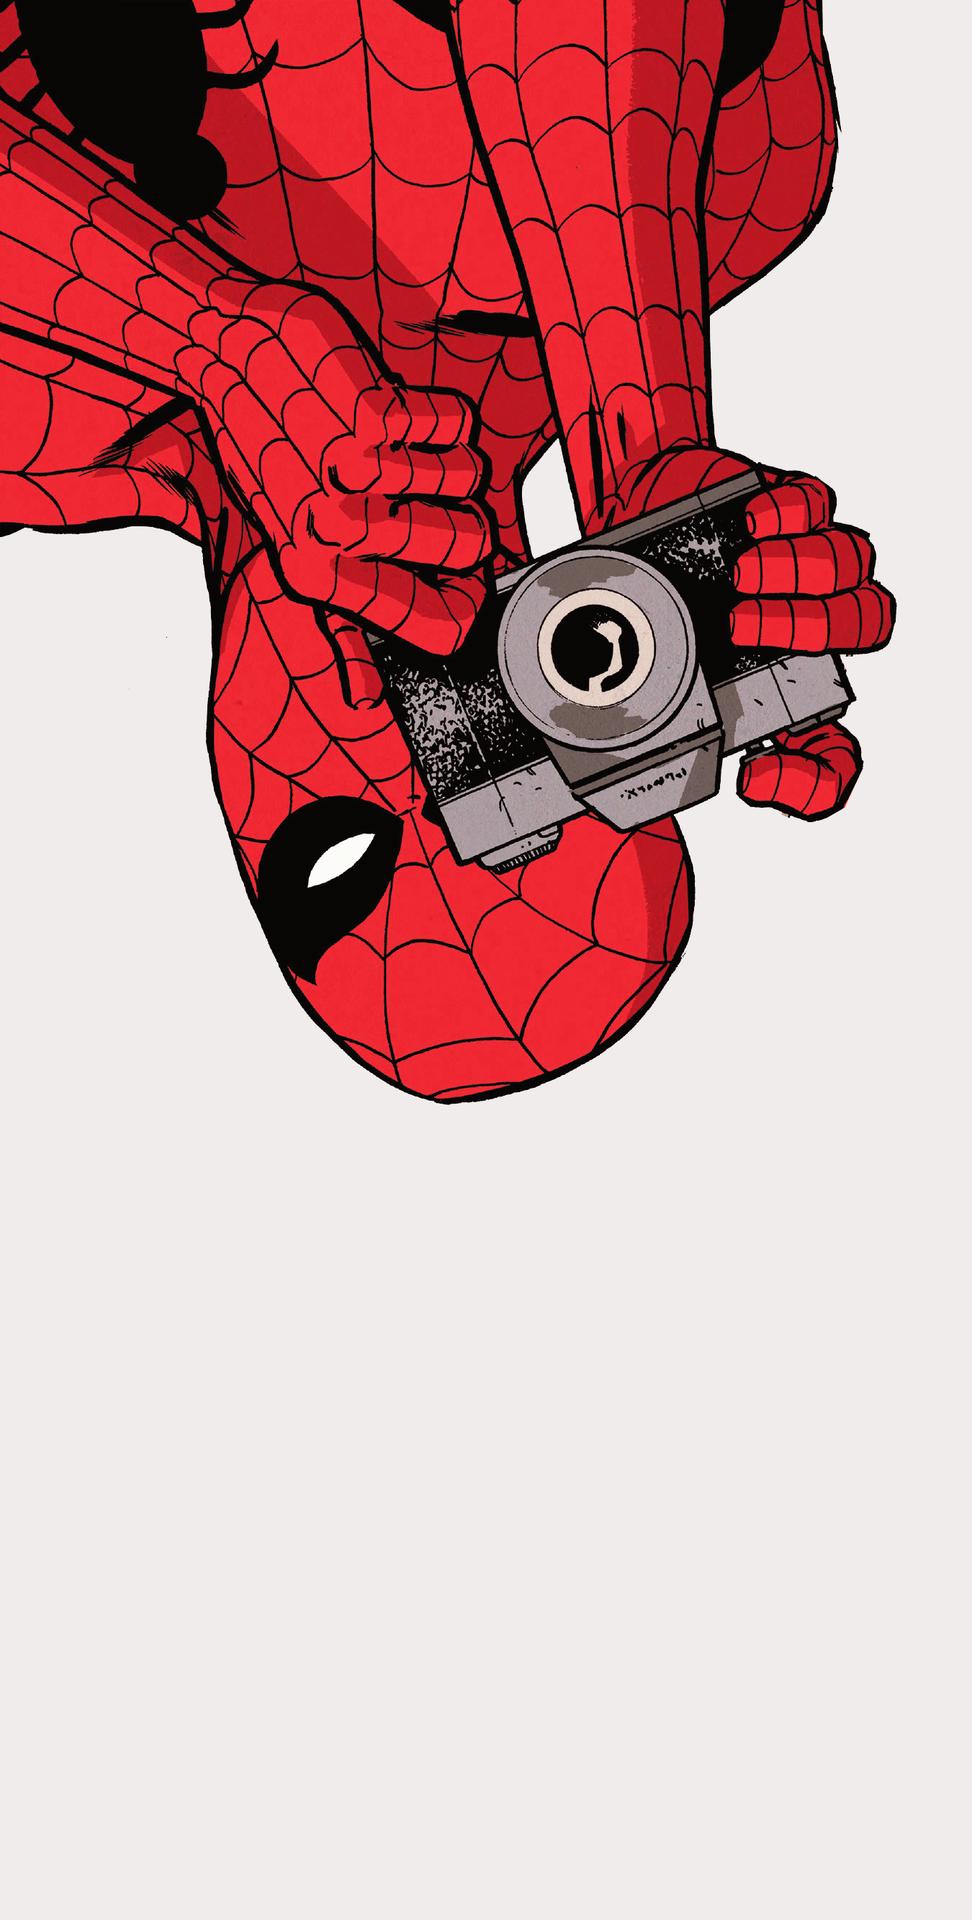 Marvel Comics Everyday Dailyspiderman The Amazing Spider Man